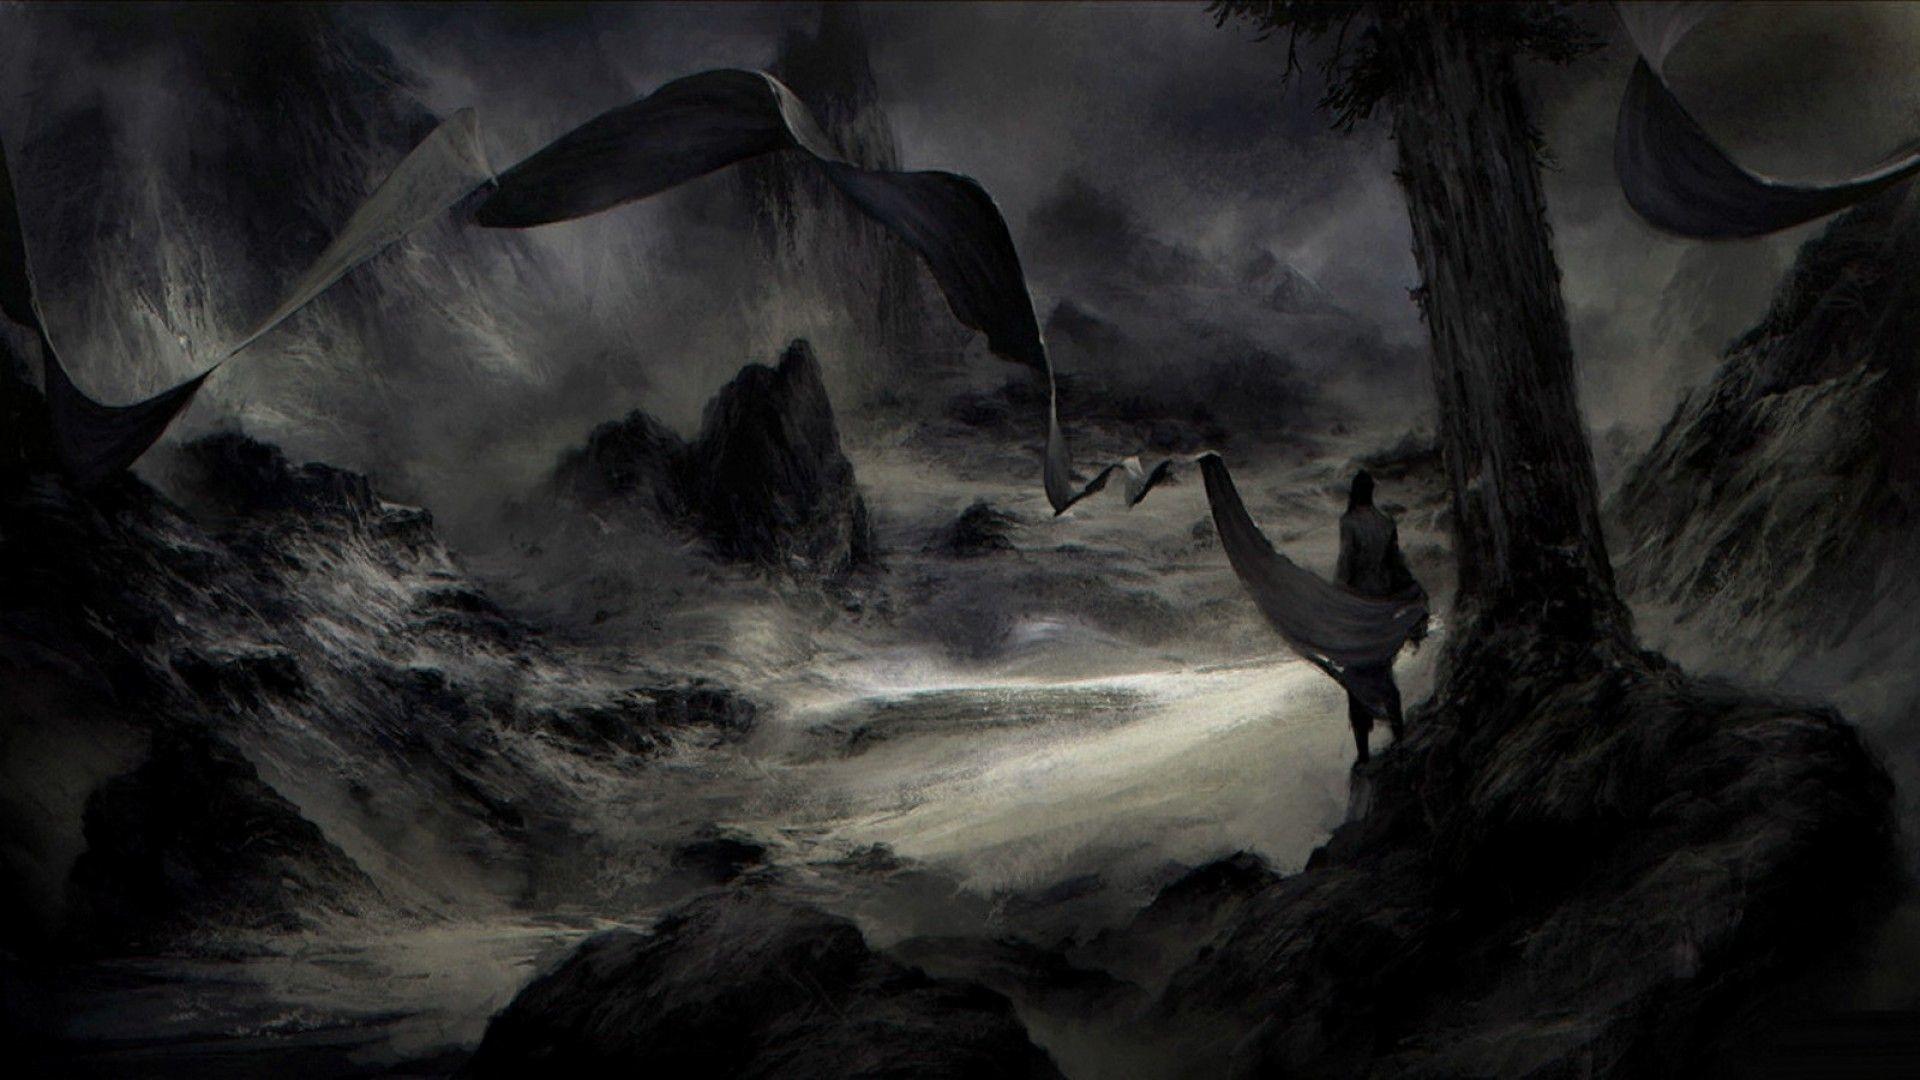 Dark Fantasy Wallpaper Hd Free Download